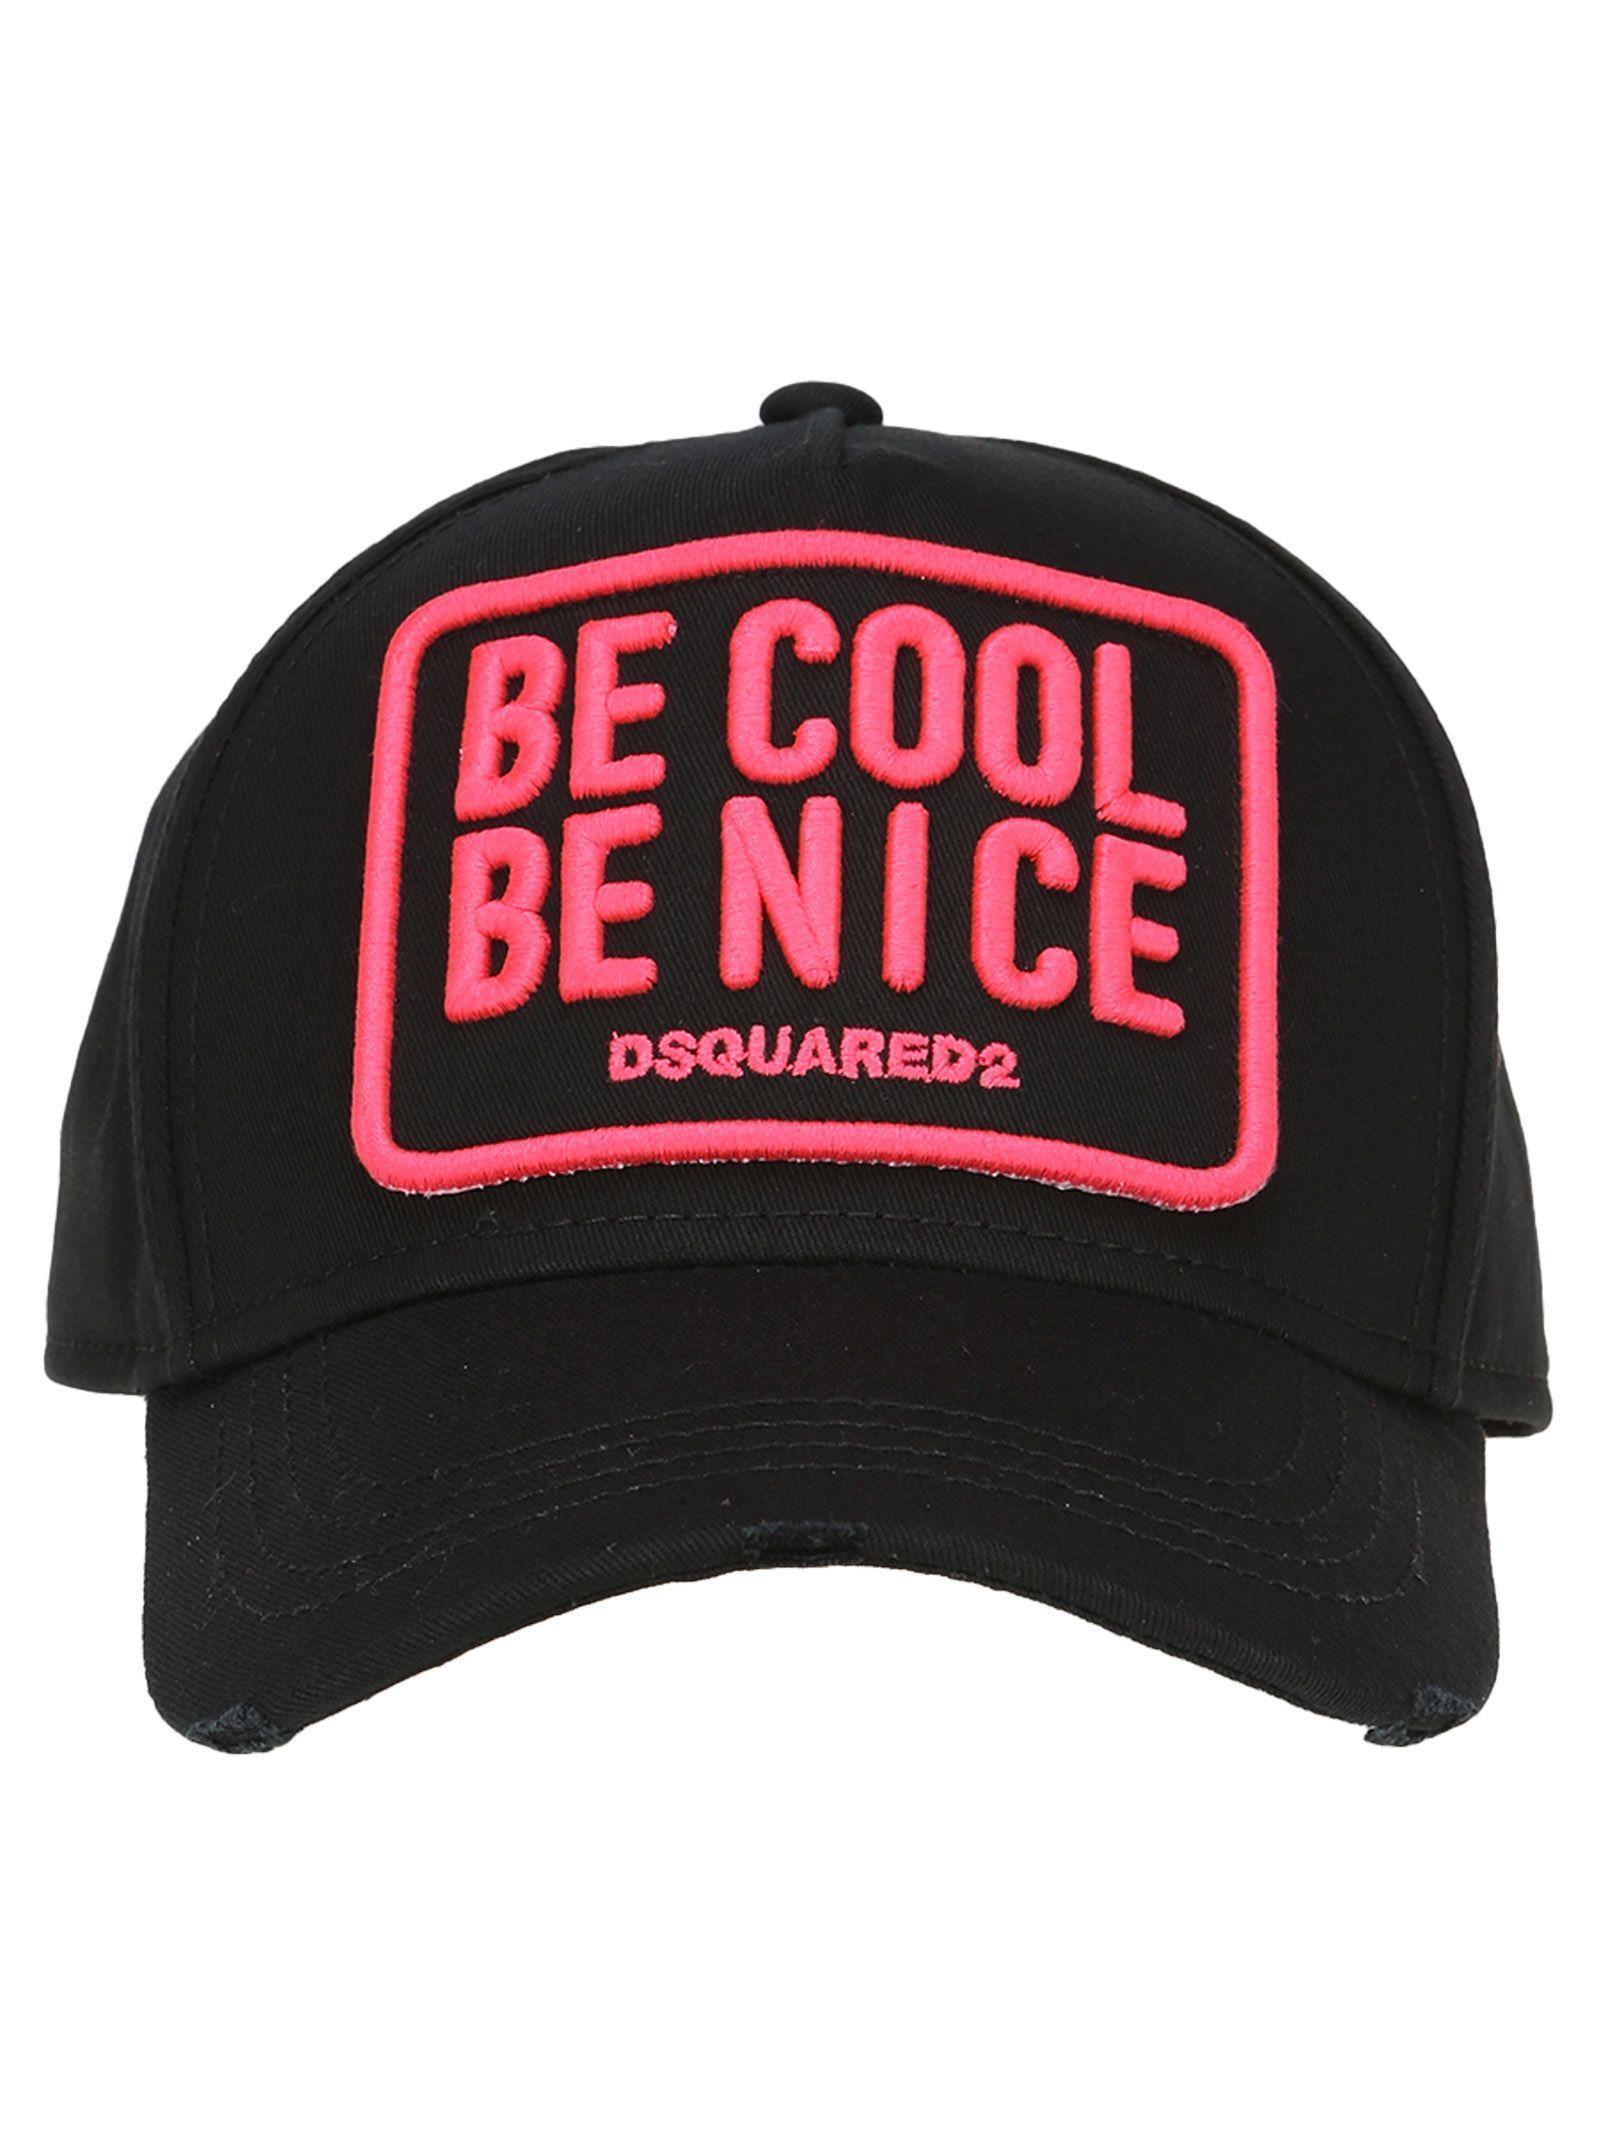 32113c194c1 Dsquared2 Bee Cool Be Nice Black Cotton Baseball Hat In Black Fuchsia